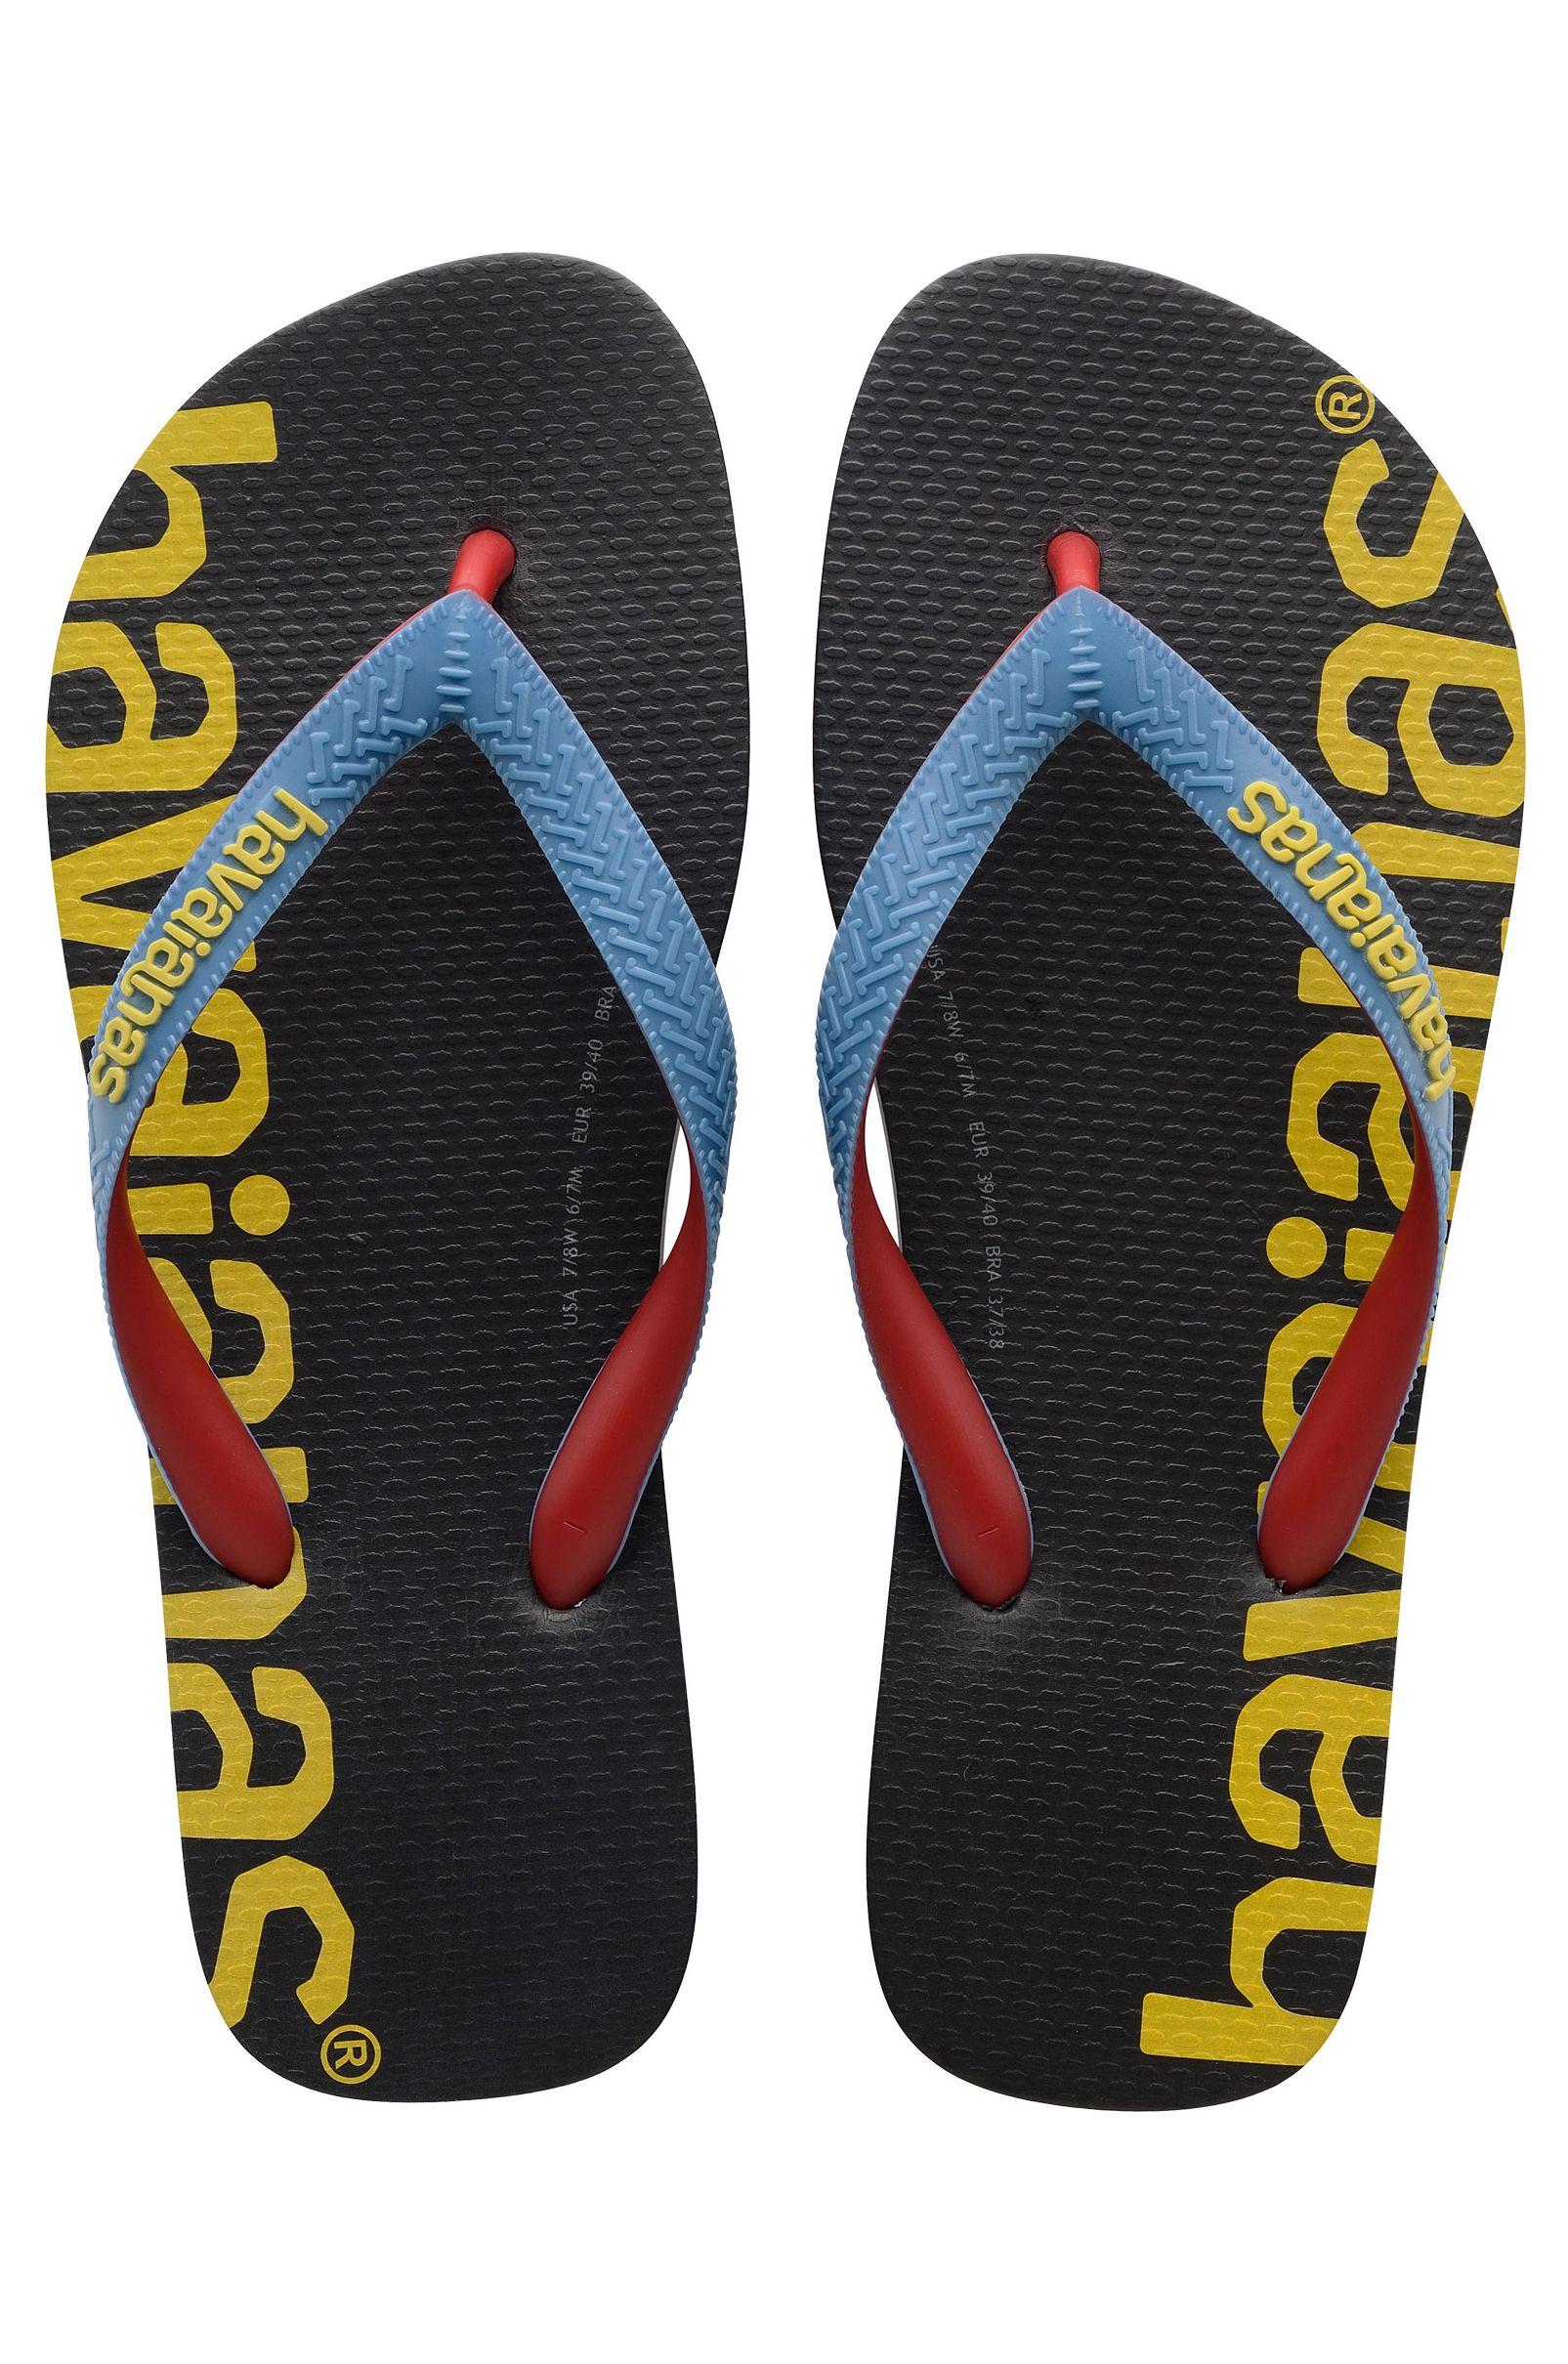 Havaianas Sandals TOP LOGOMANIA HIGHTECH Black